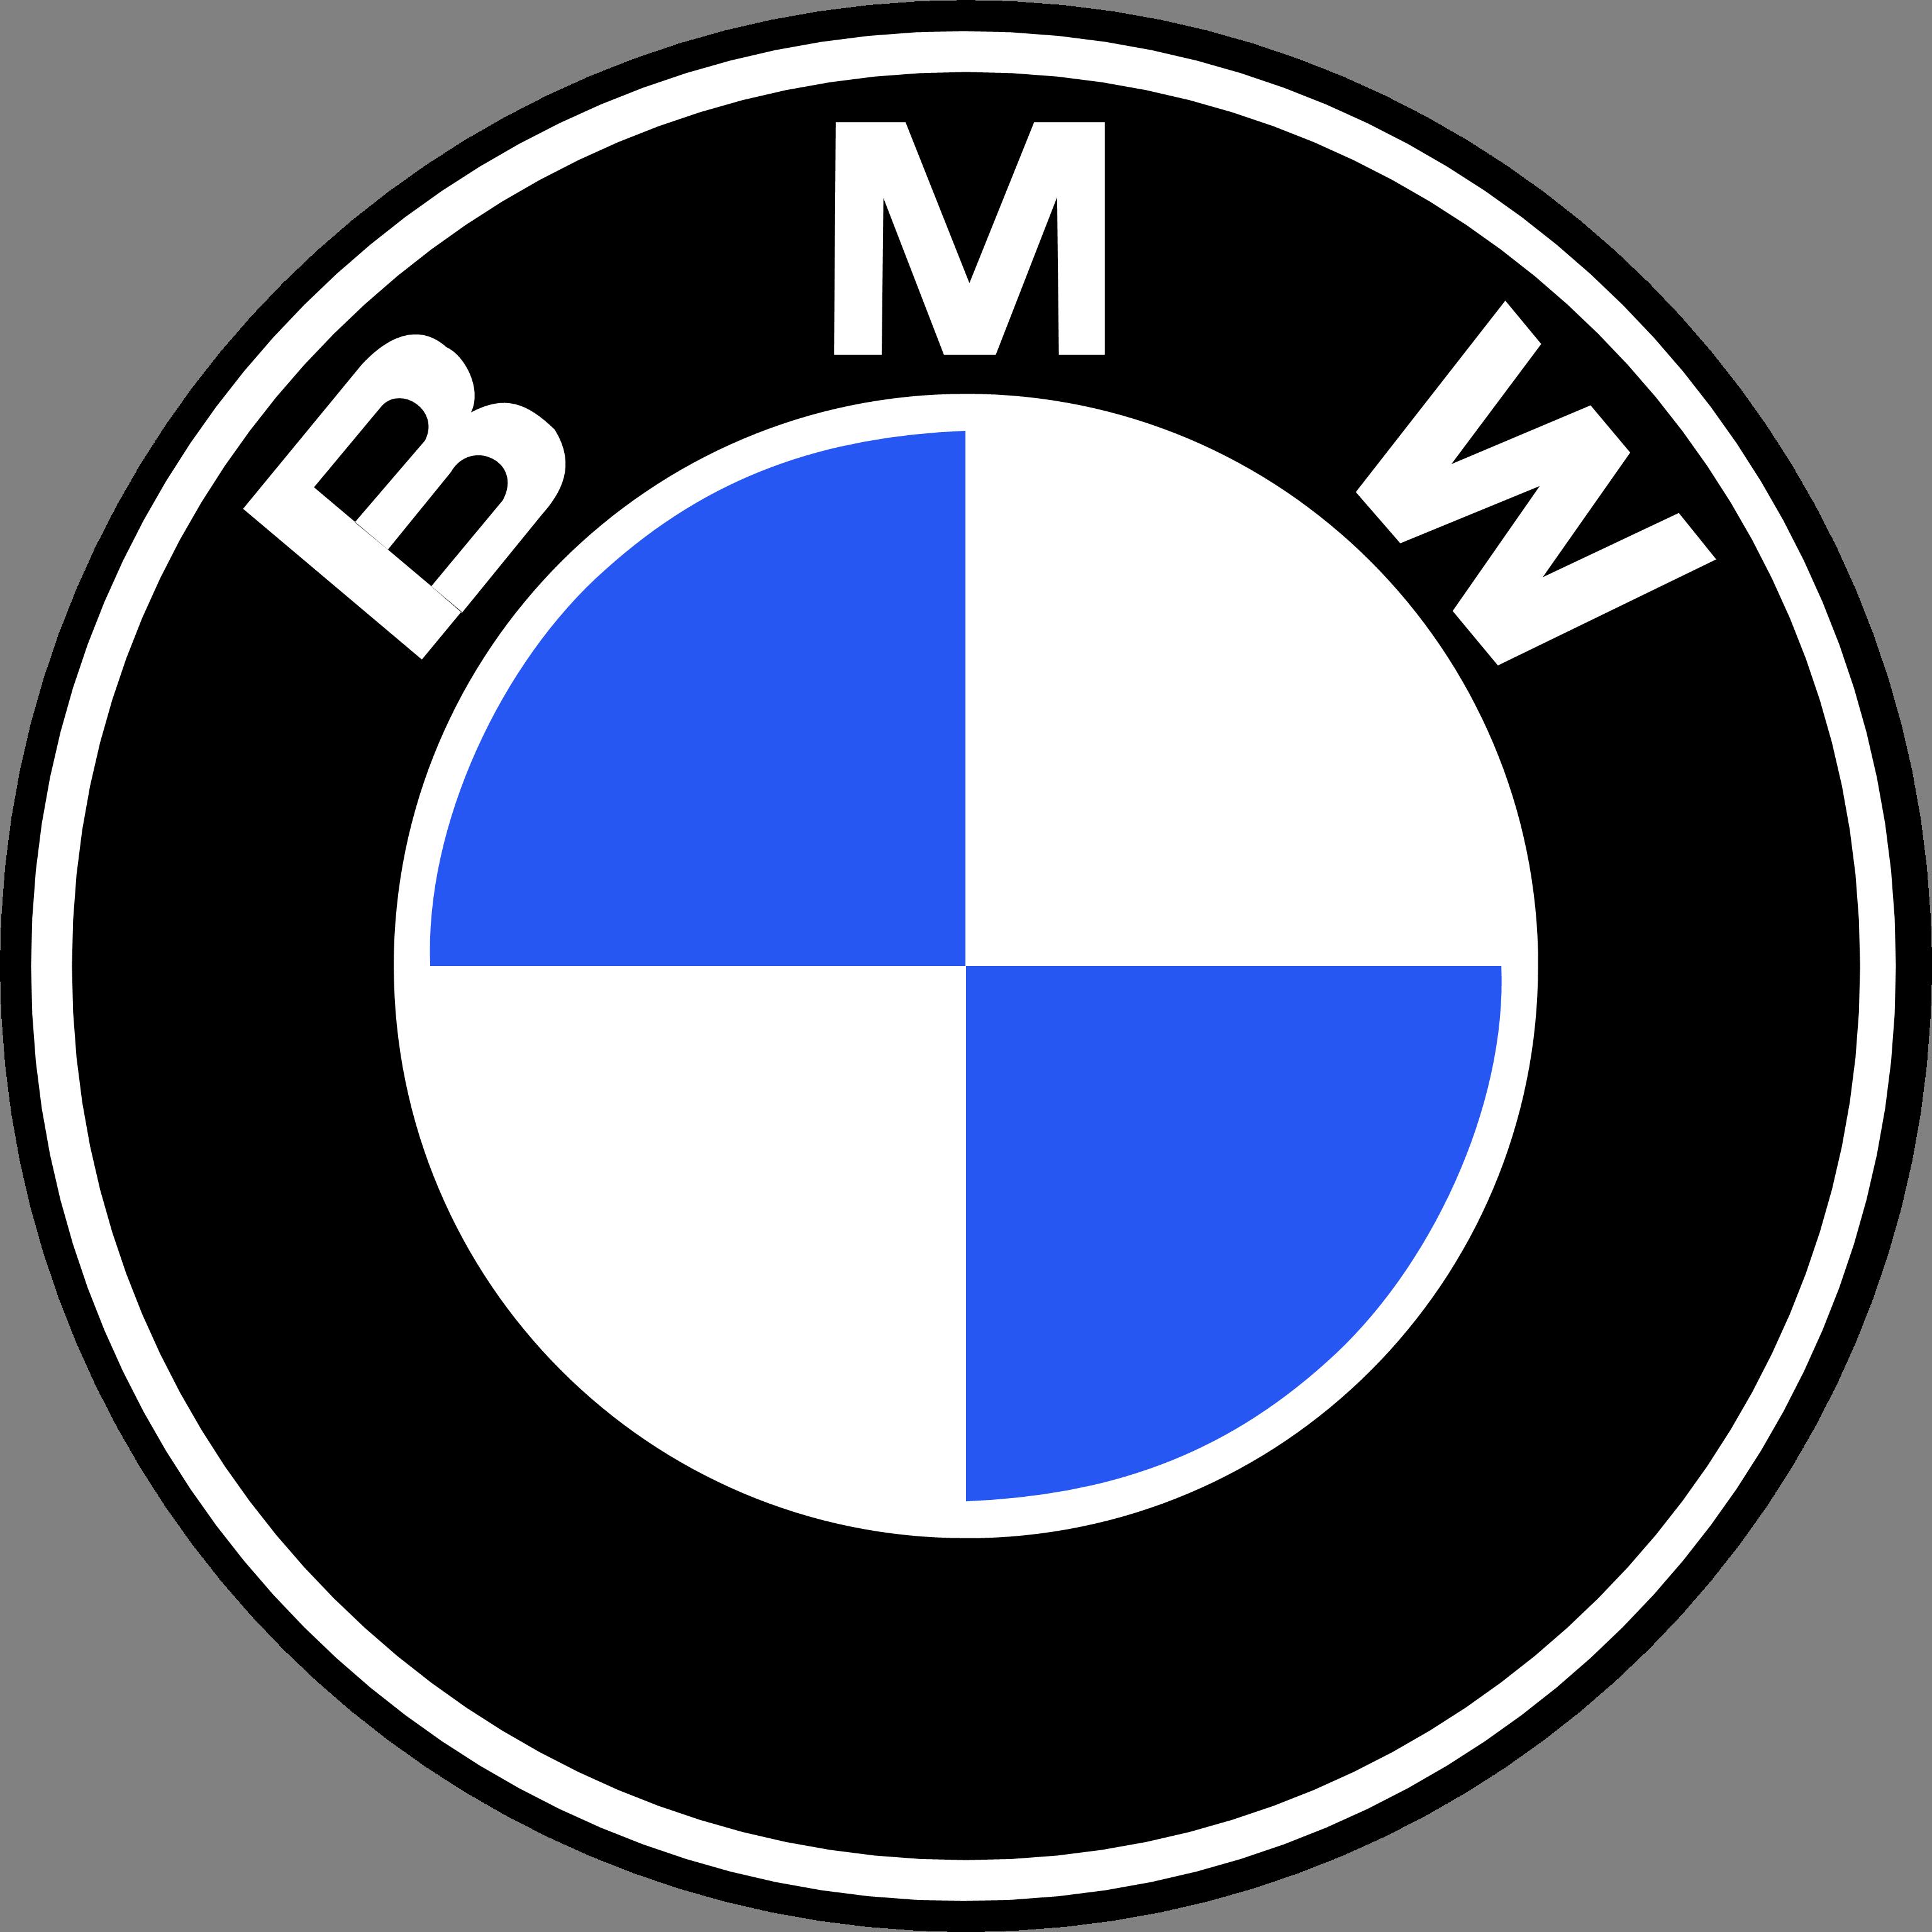 Youtube clipart bape. Bmw logo google search